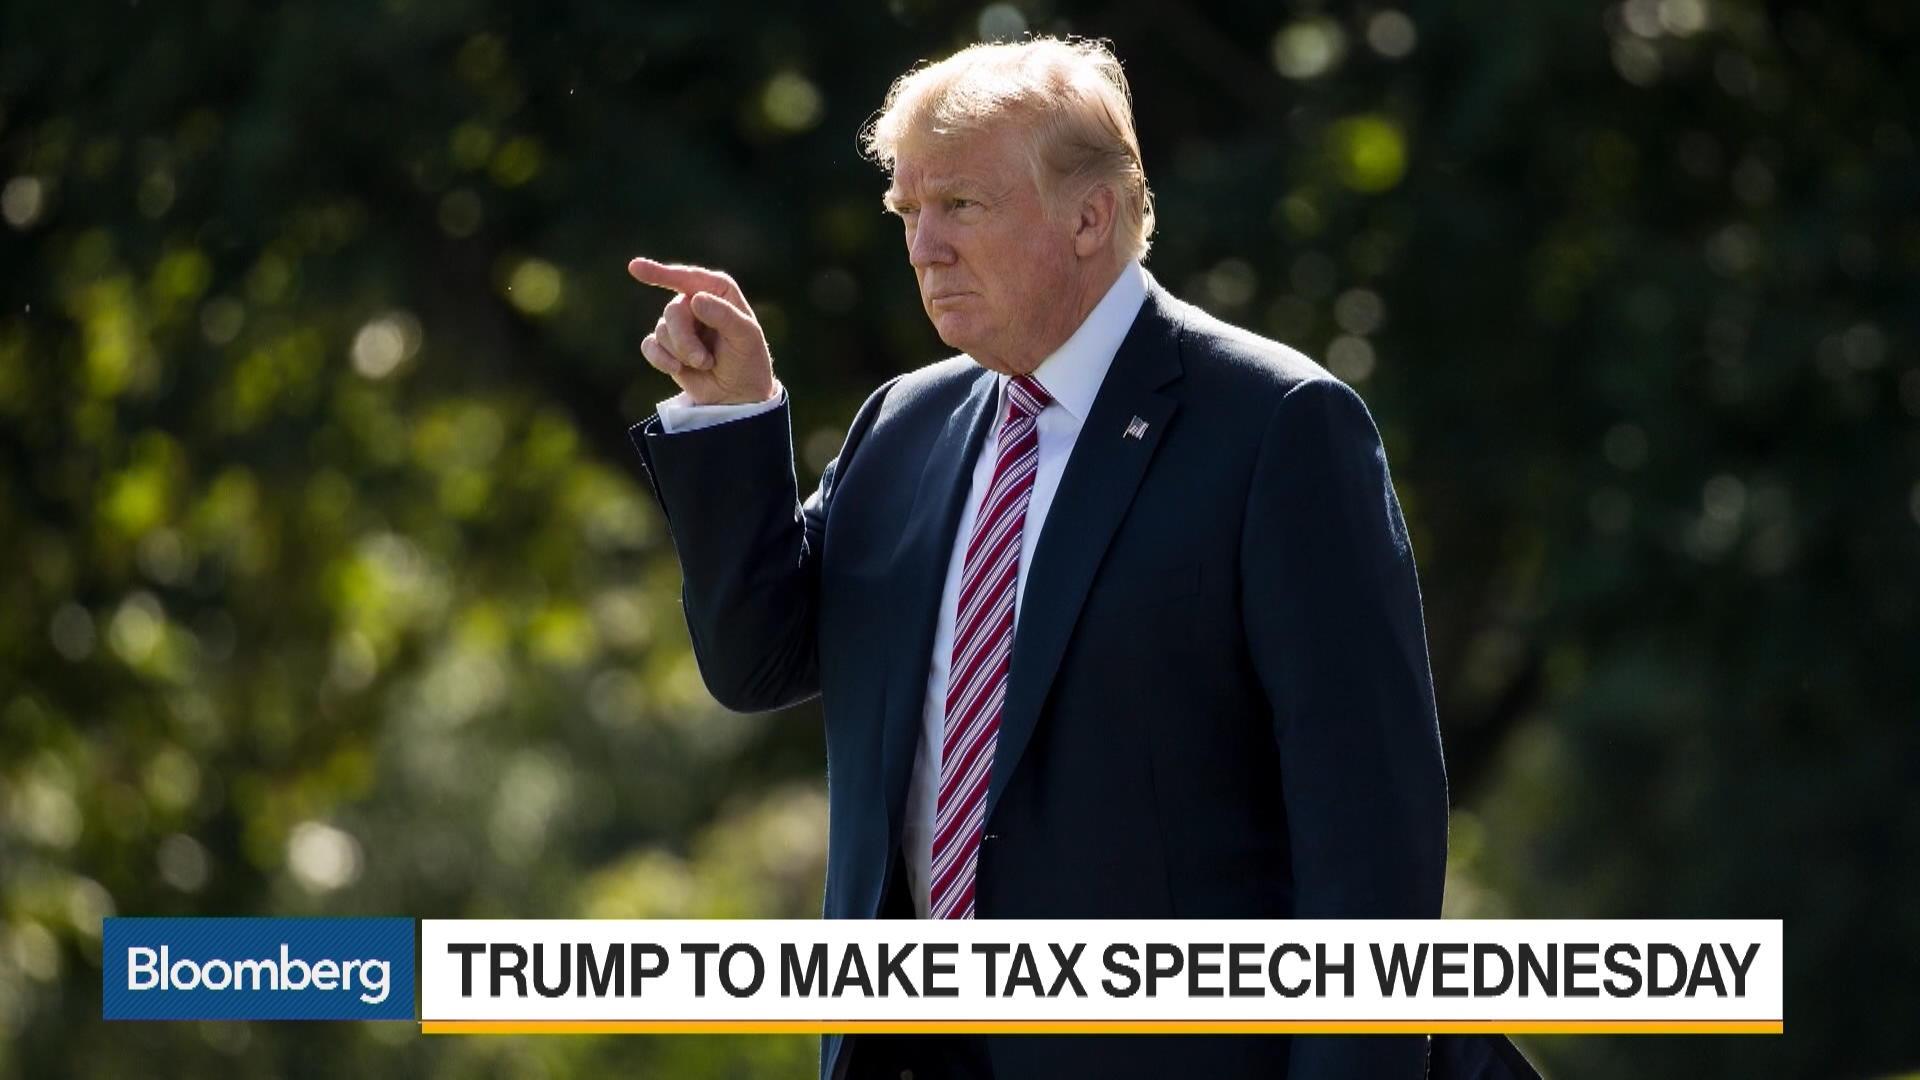 Trump to Make Tax Speech Wednesday